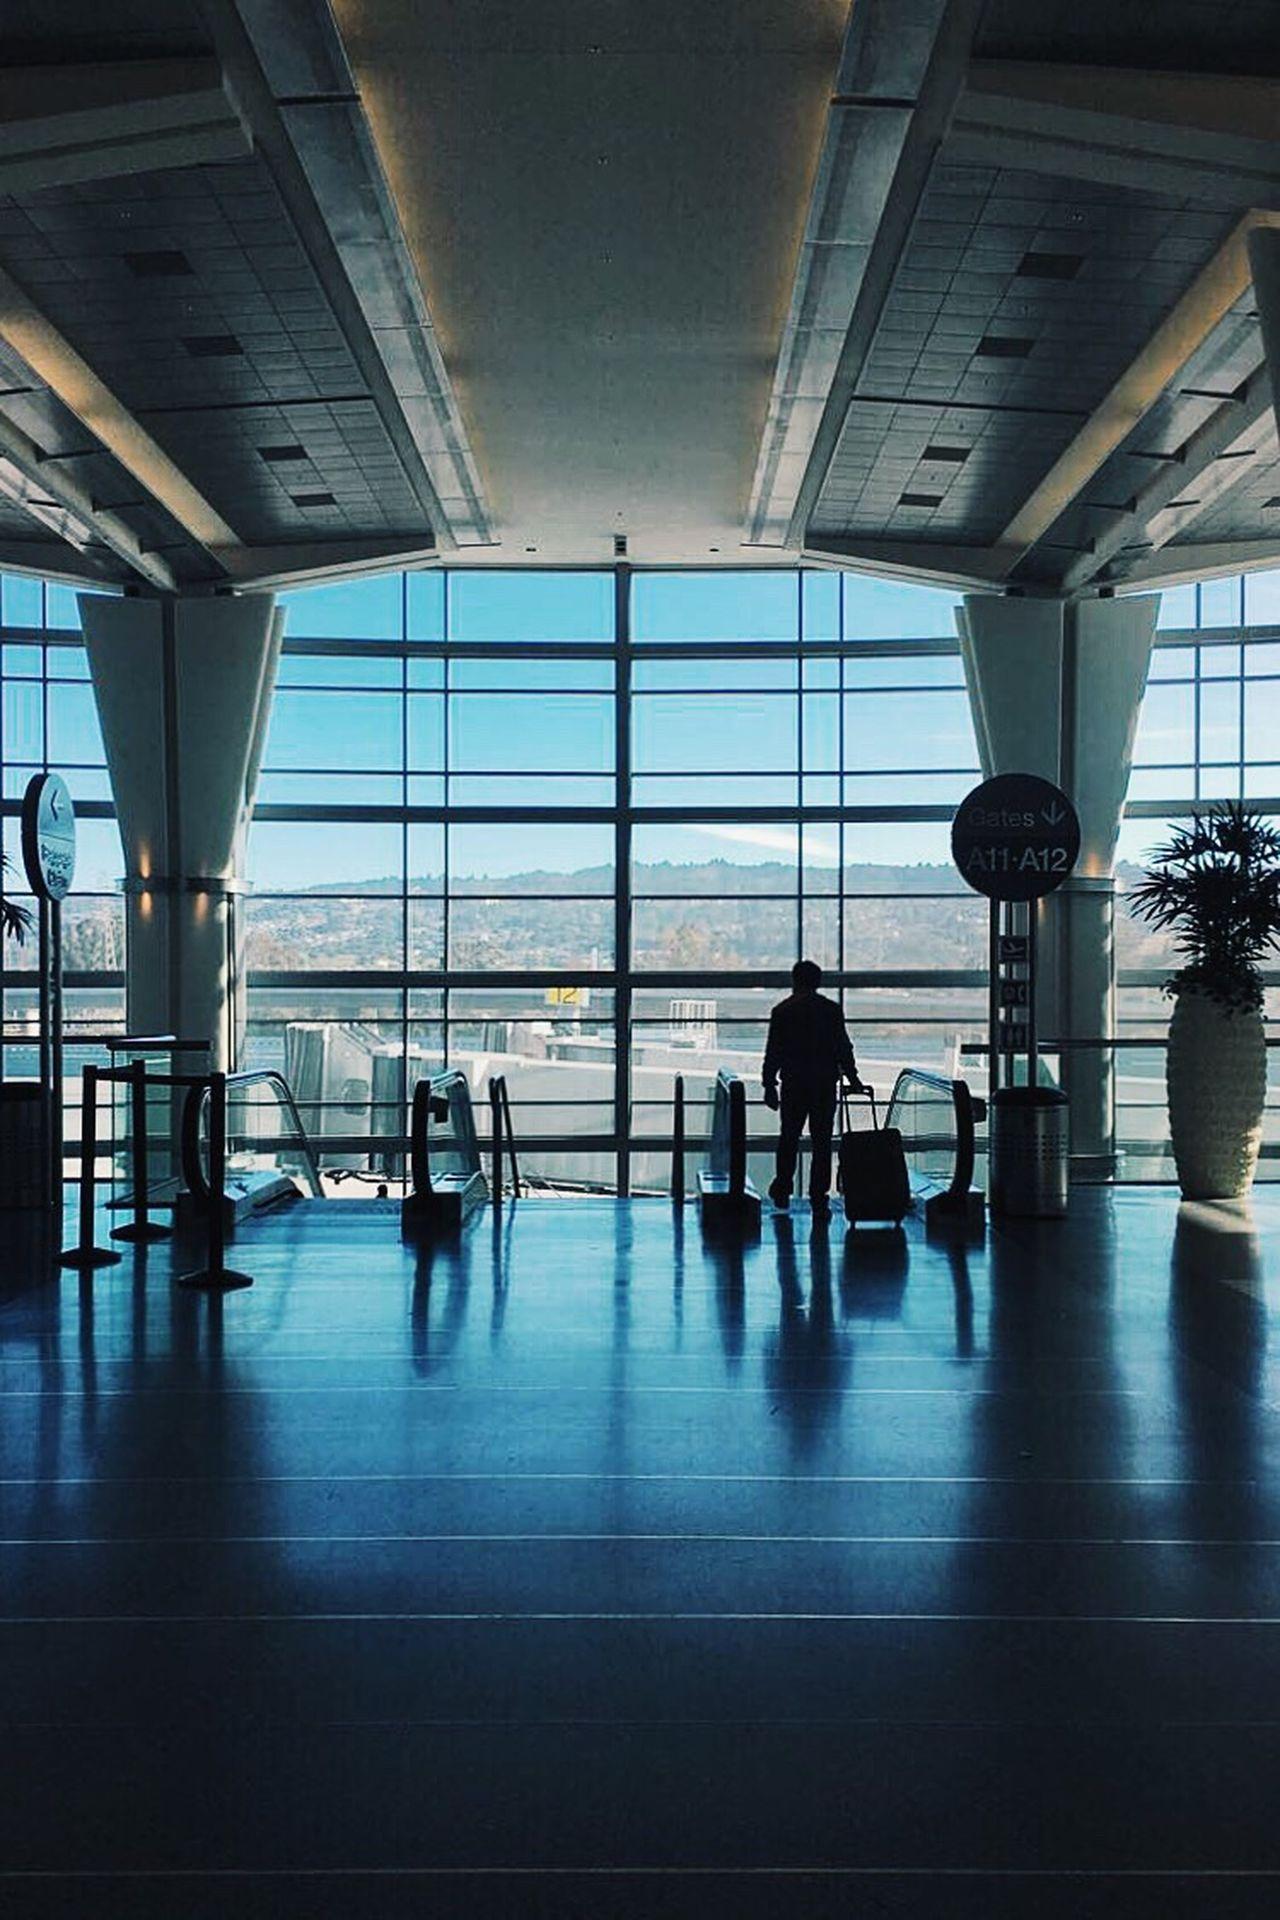 Traveling Airport Transportation Symmetry